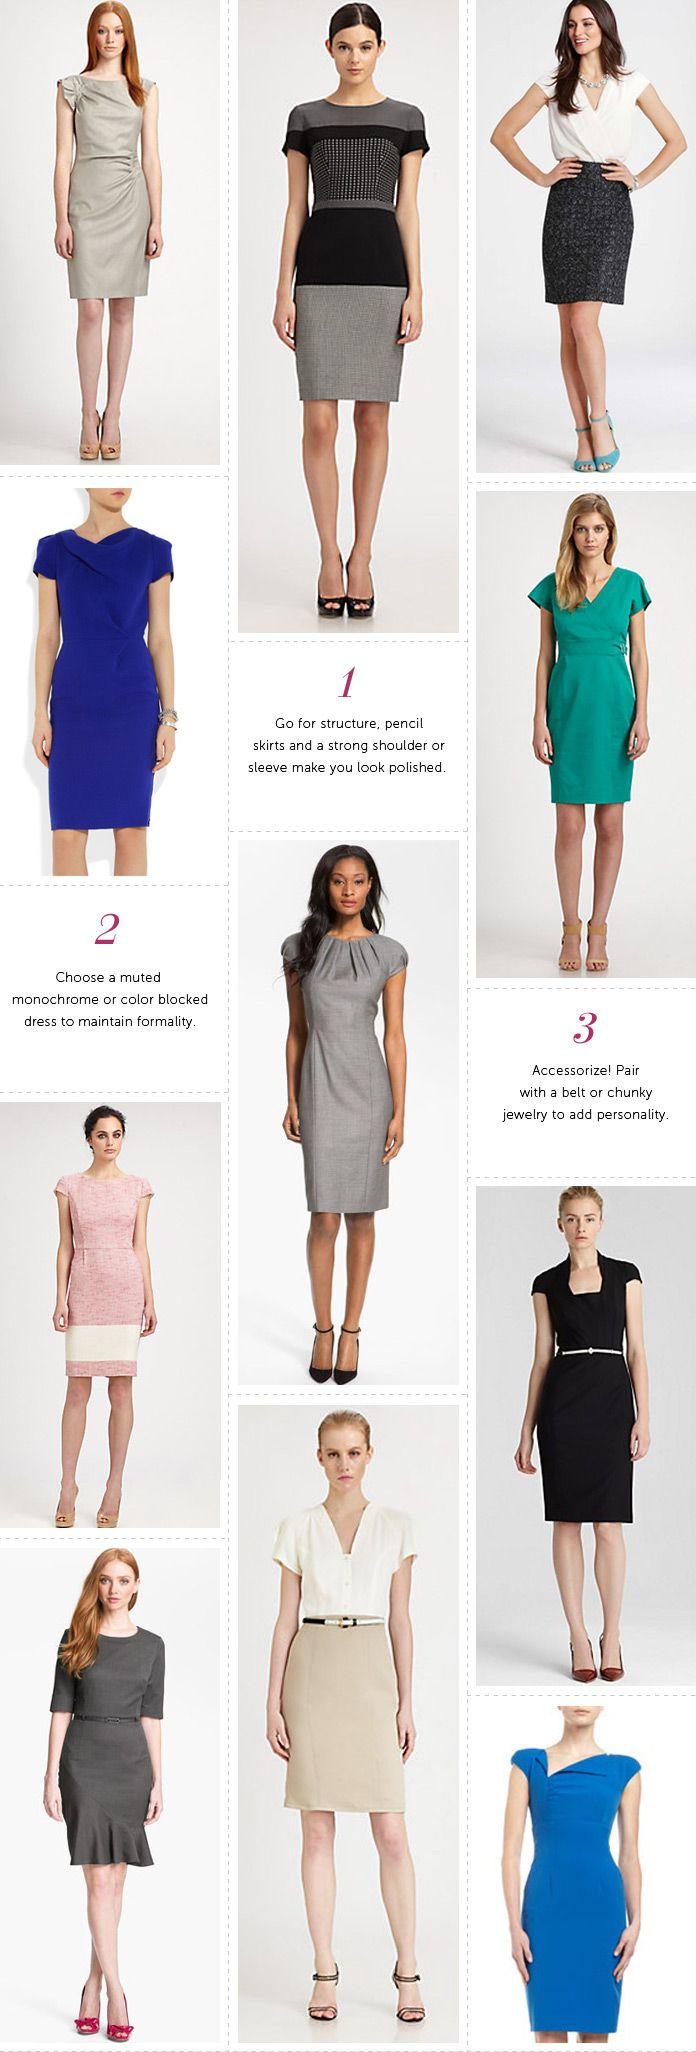 Professionelle: Power Dresses